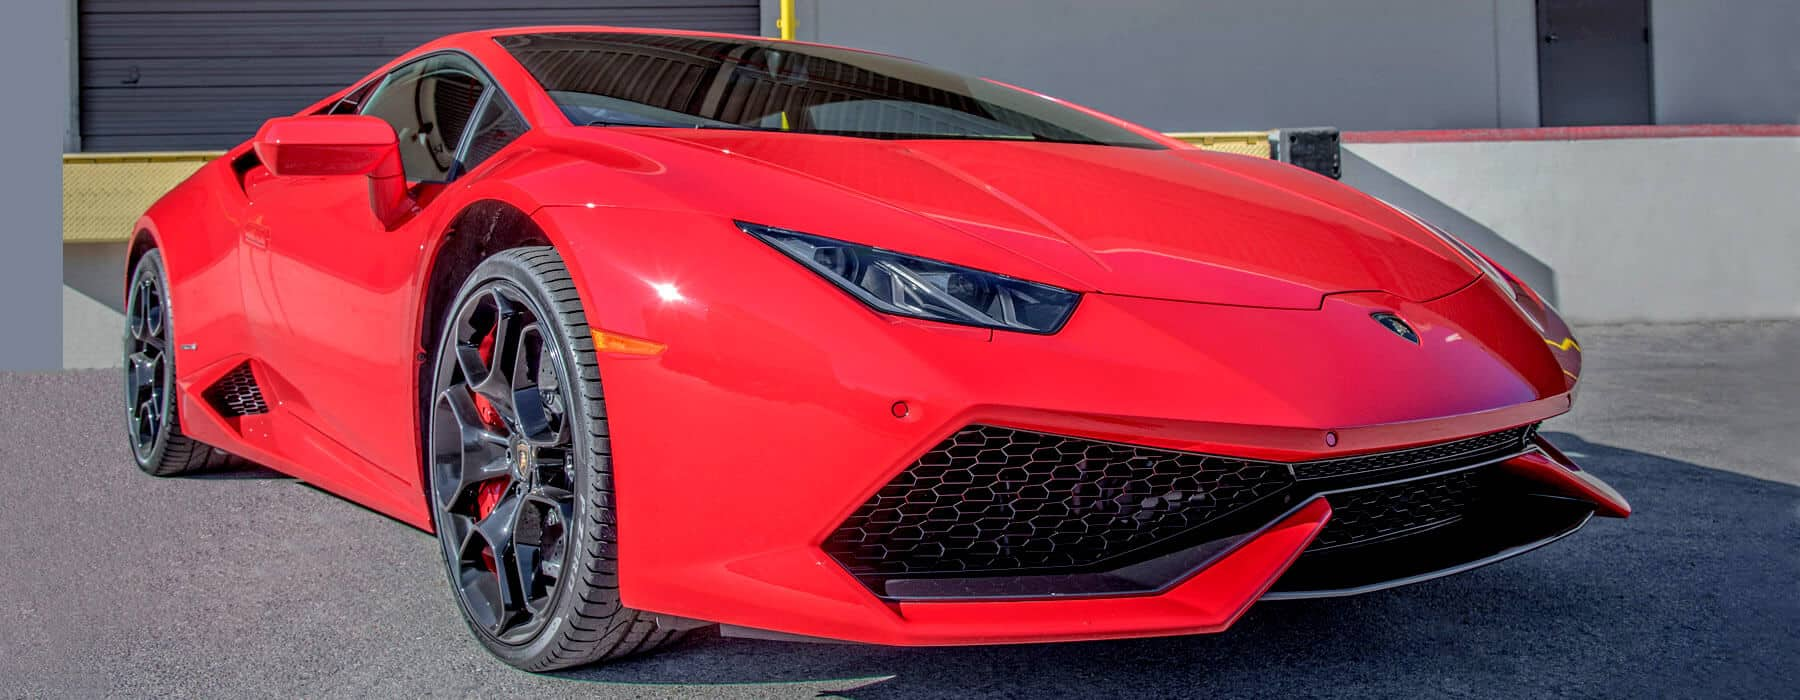 Las Vegas Sports Exotic Car Rental Ferrari